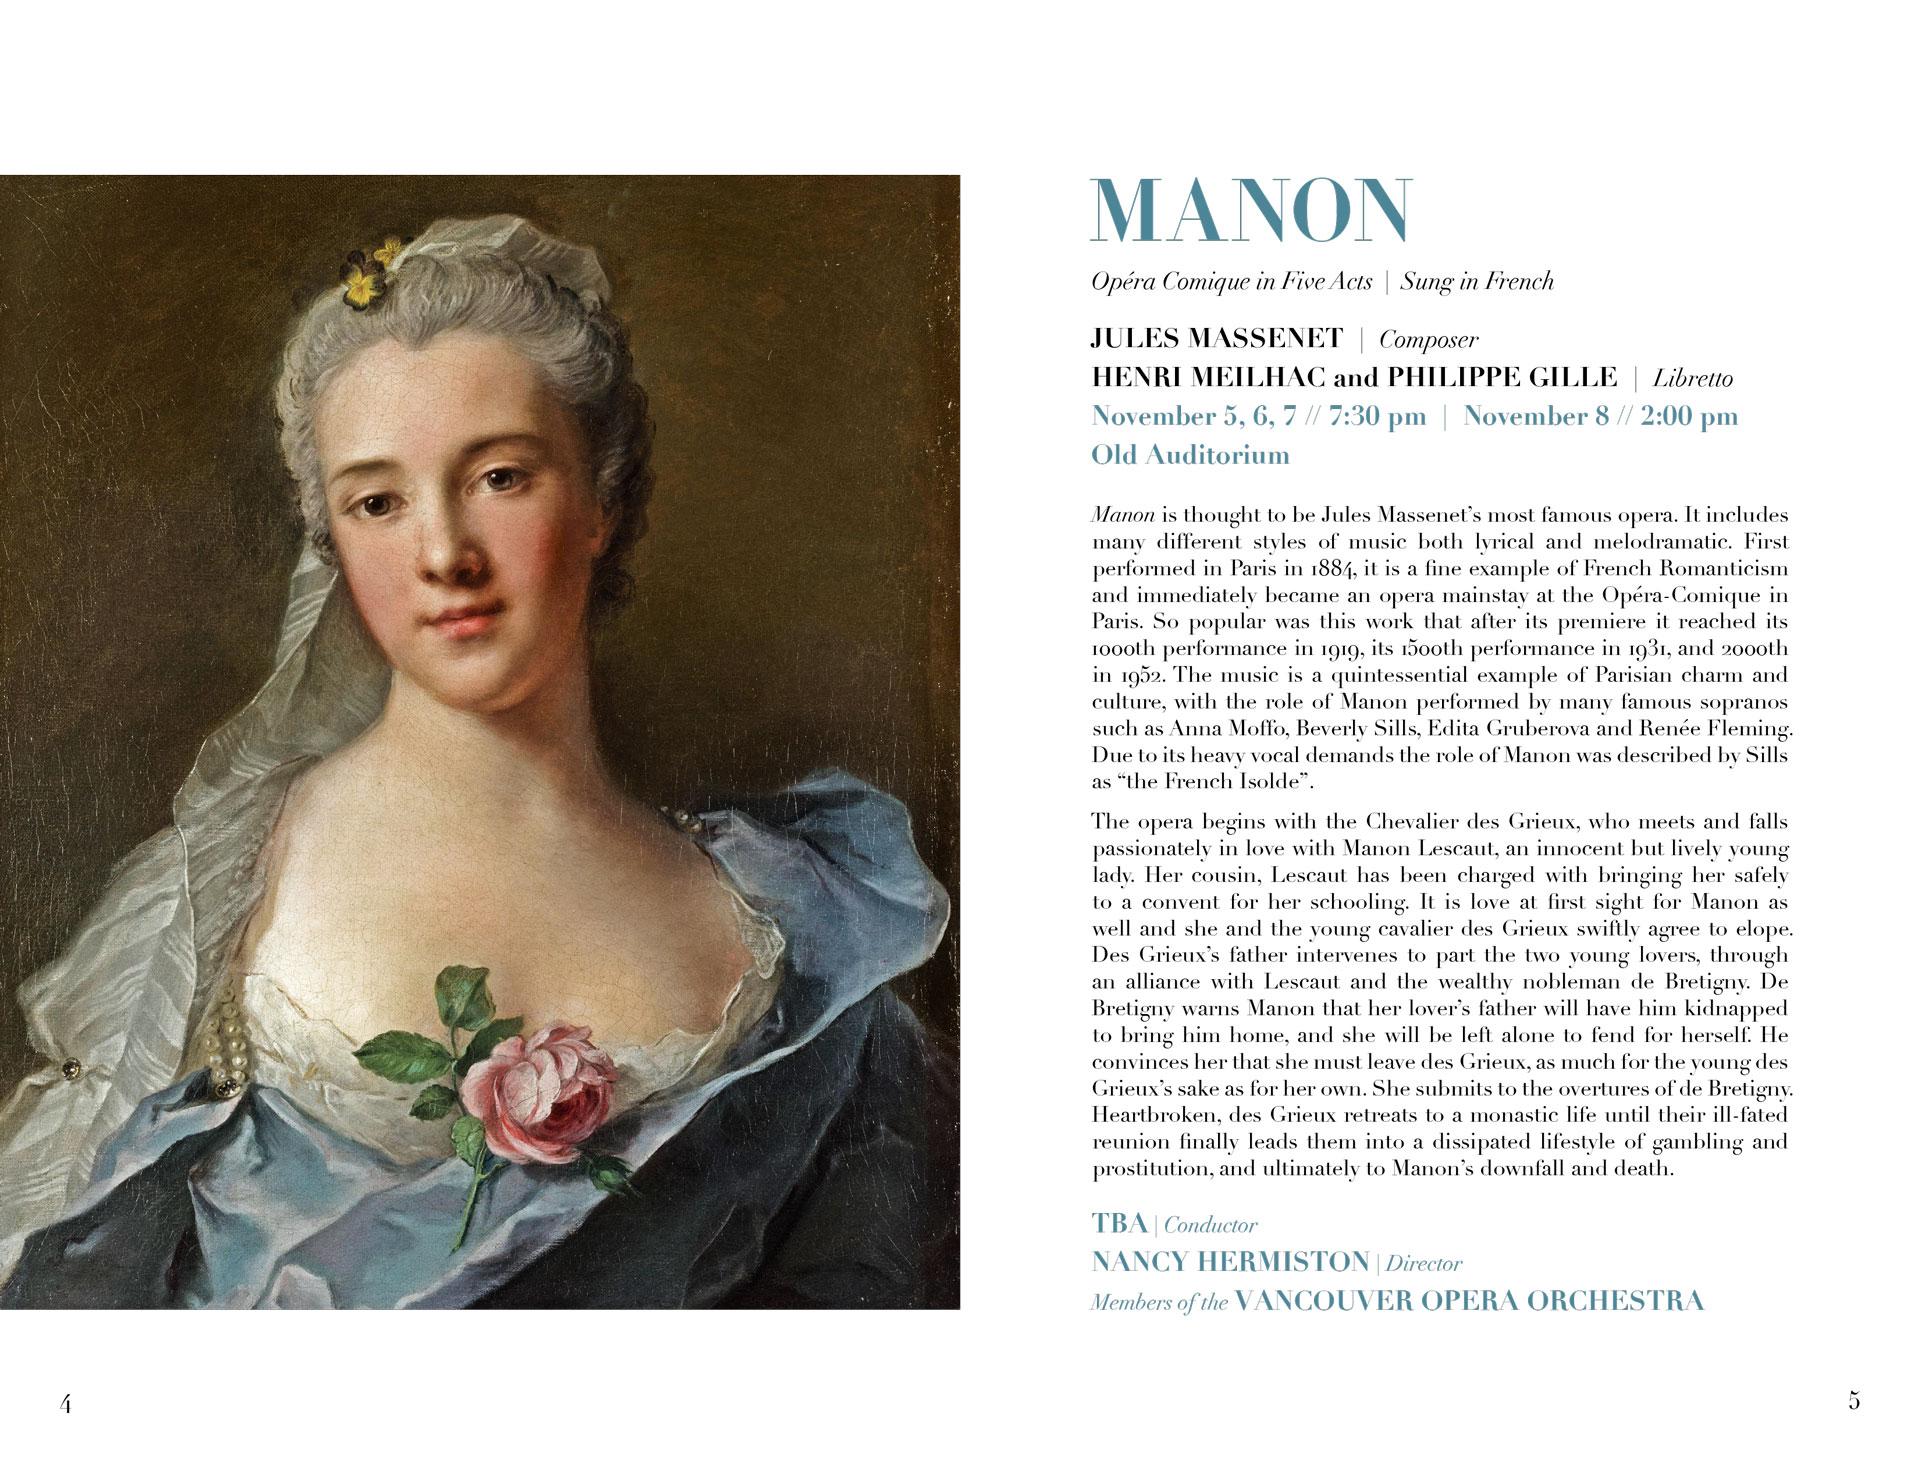 programme spread for Massenet opera Manon